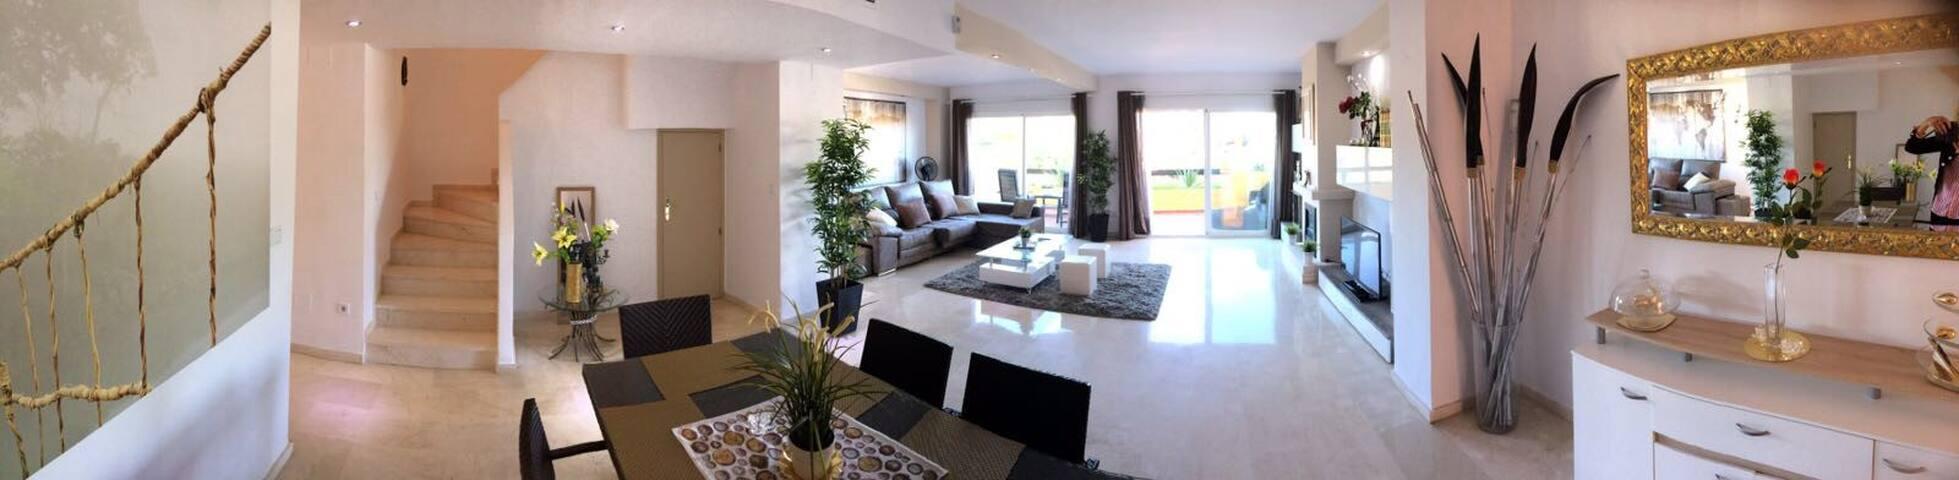 Ático Guadalmina Alta golf Marbella - Marbella  - Condominio